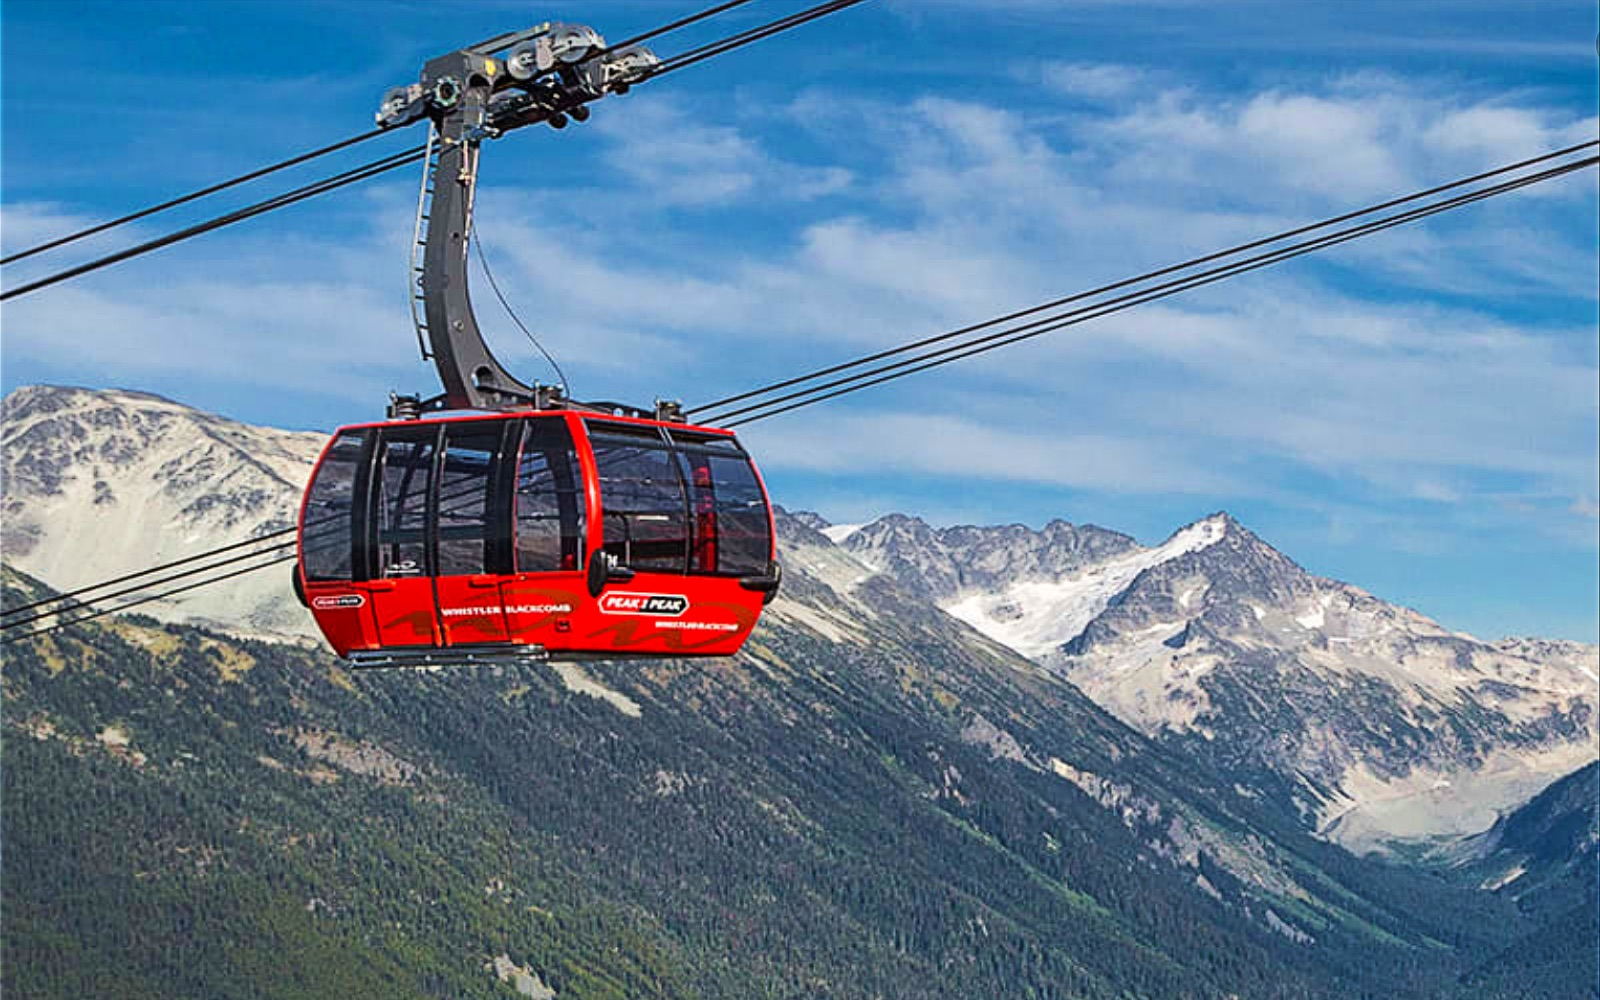 The Peak 2 Peak Gondola in front of a mountain backdrop